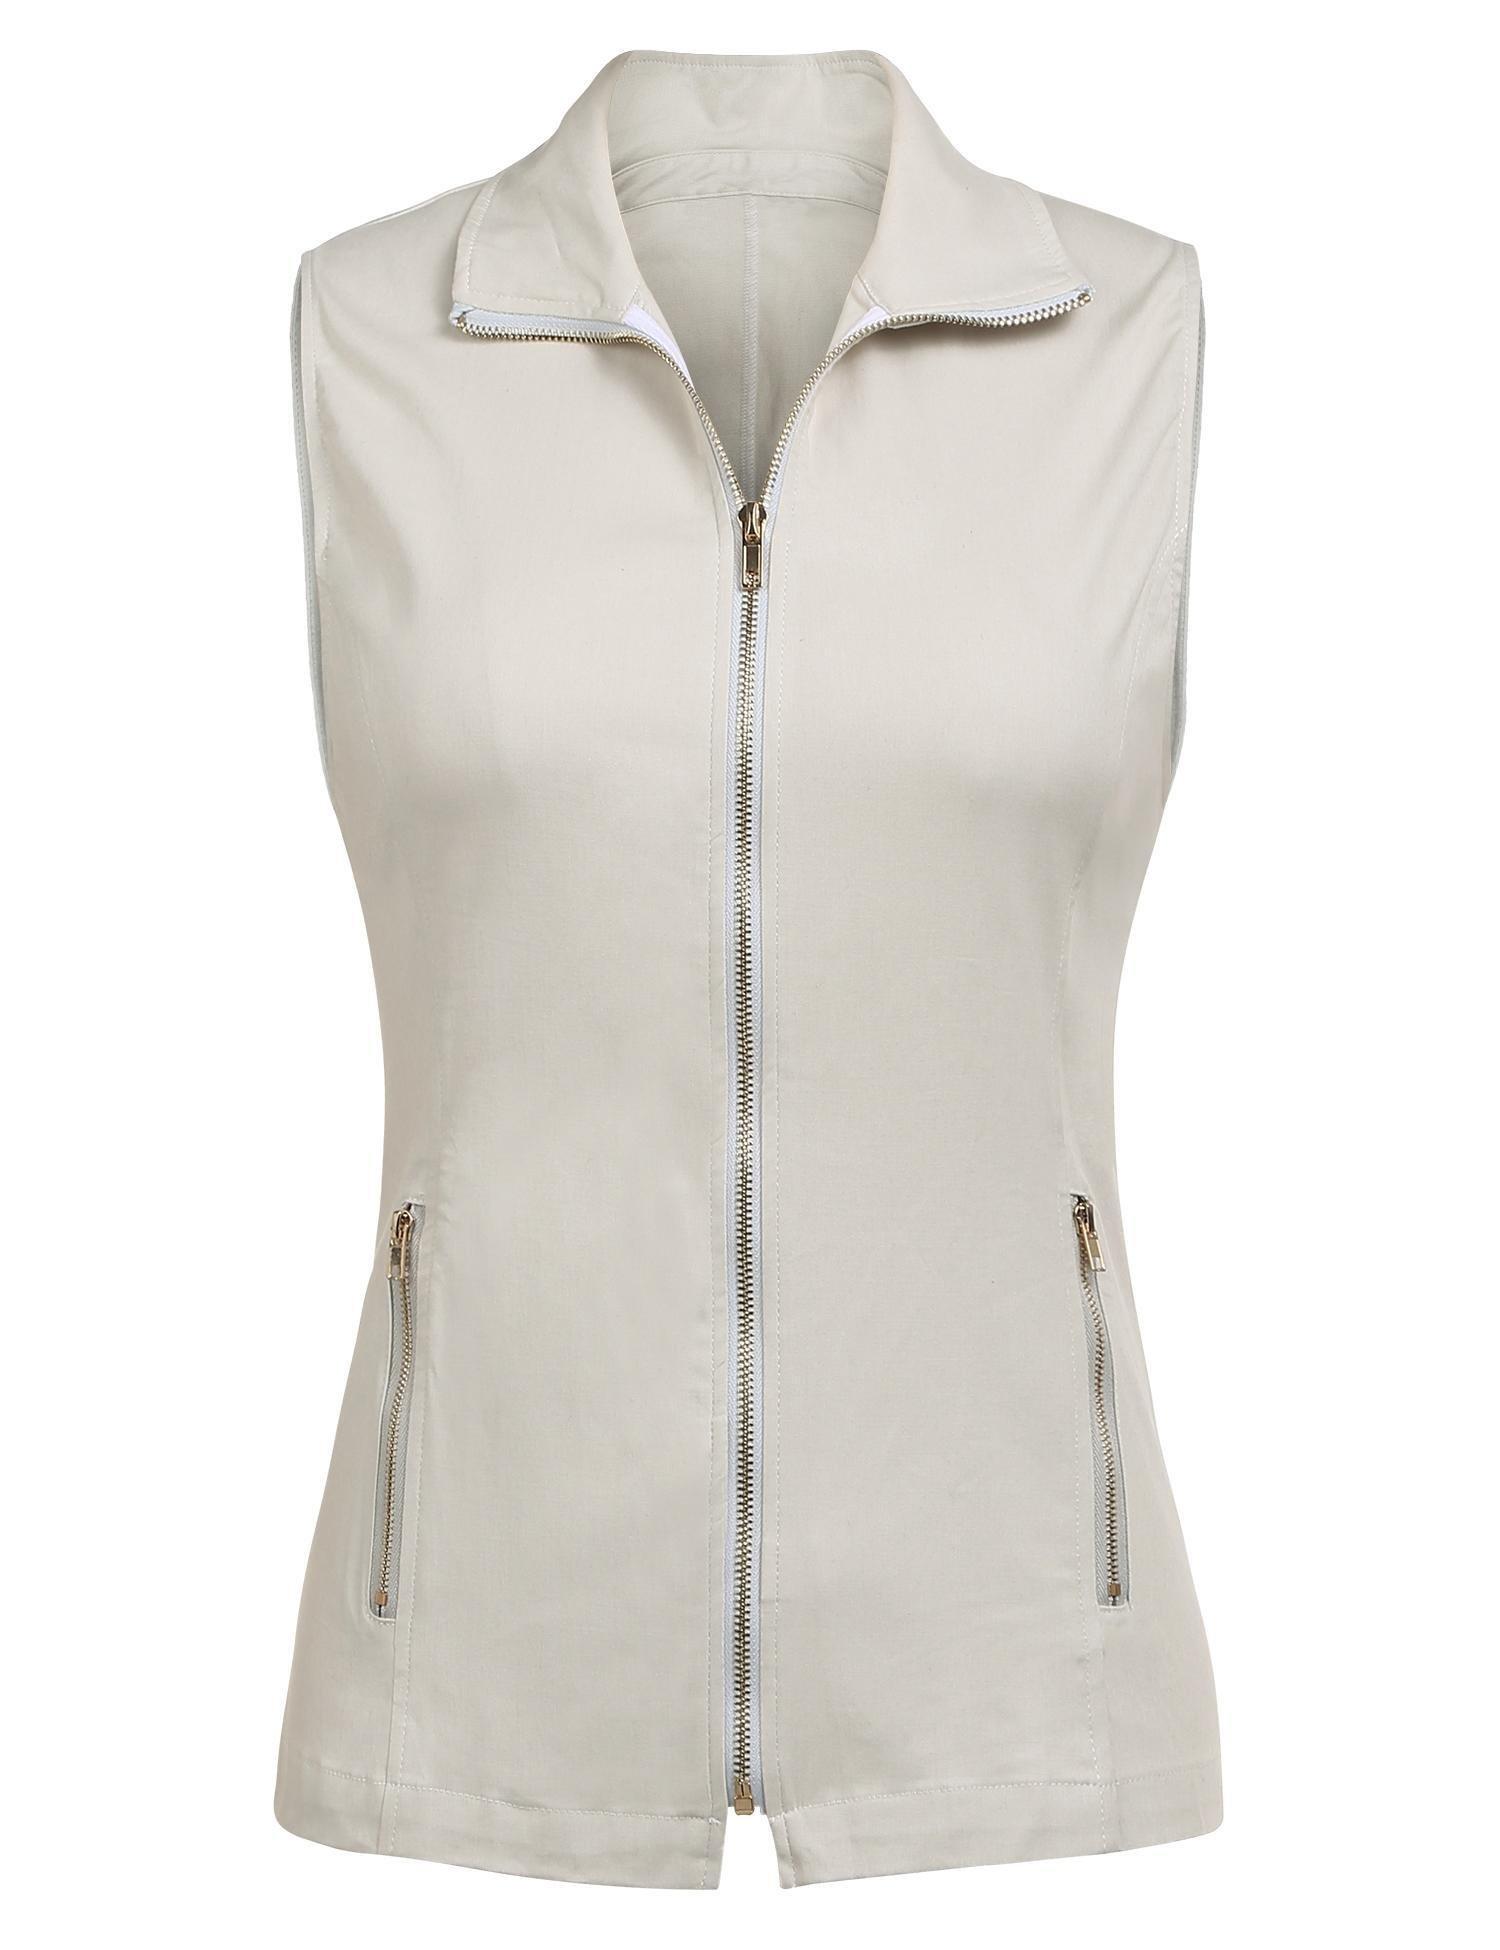 Dealwell Women Pockets Jacket Military Lightweight Full Zip Sleeveless Casual Vest (Beige M) by Dealwell